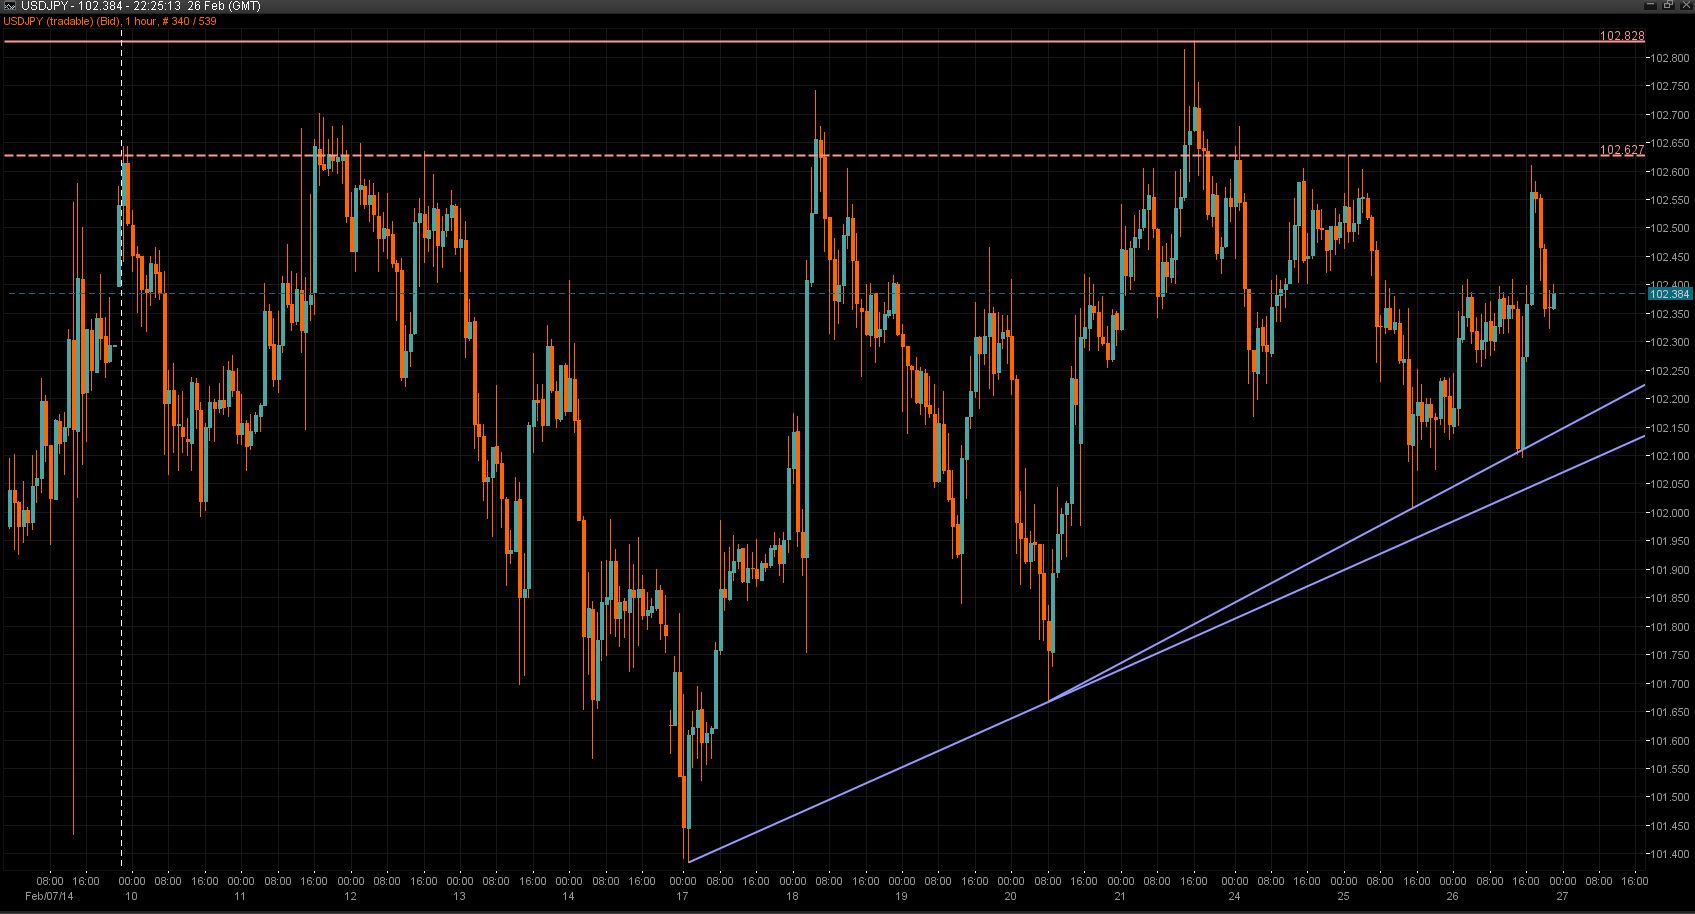 USD/JPY Chart 26 Feb 2014